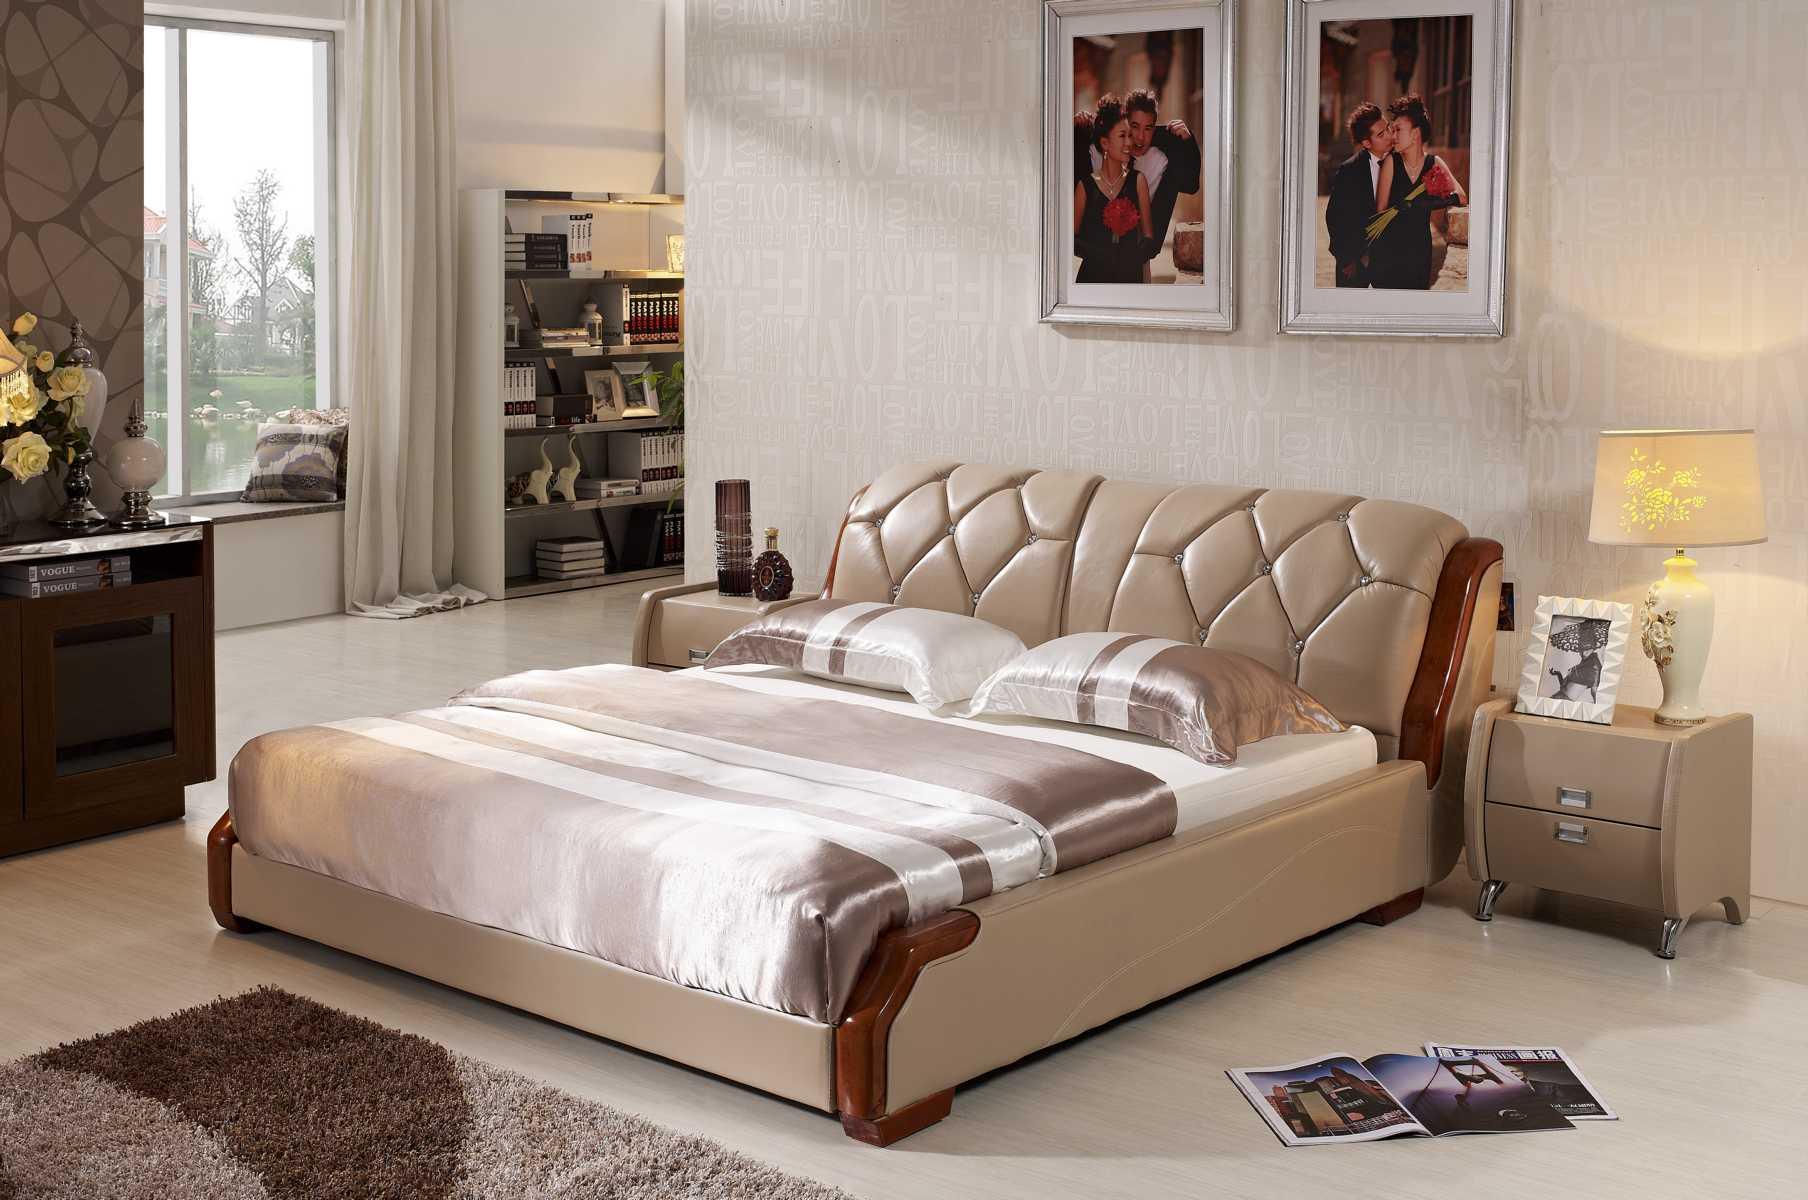 design betten in hochwertiger qualit t oder rundbett wts 9139 bei jv m bel. Black Bedroom Furniture Sets. Home Design Ideas